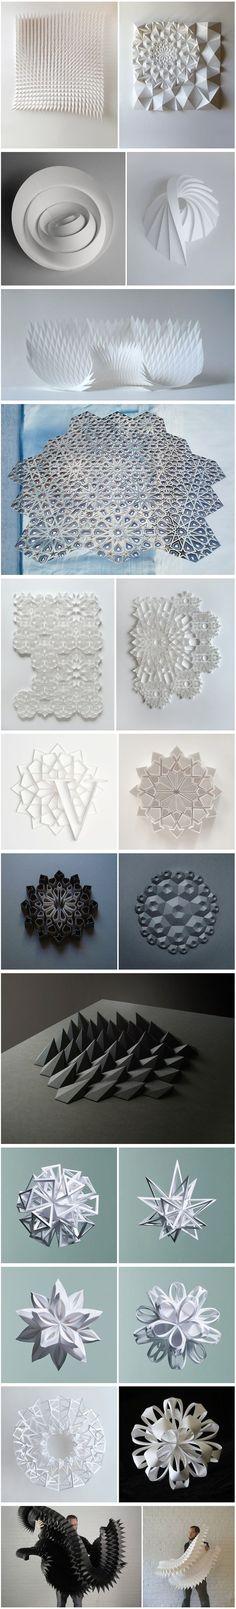 Geometric Paper Sculptures